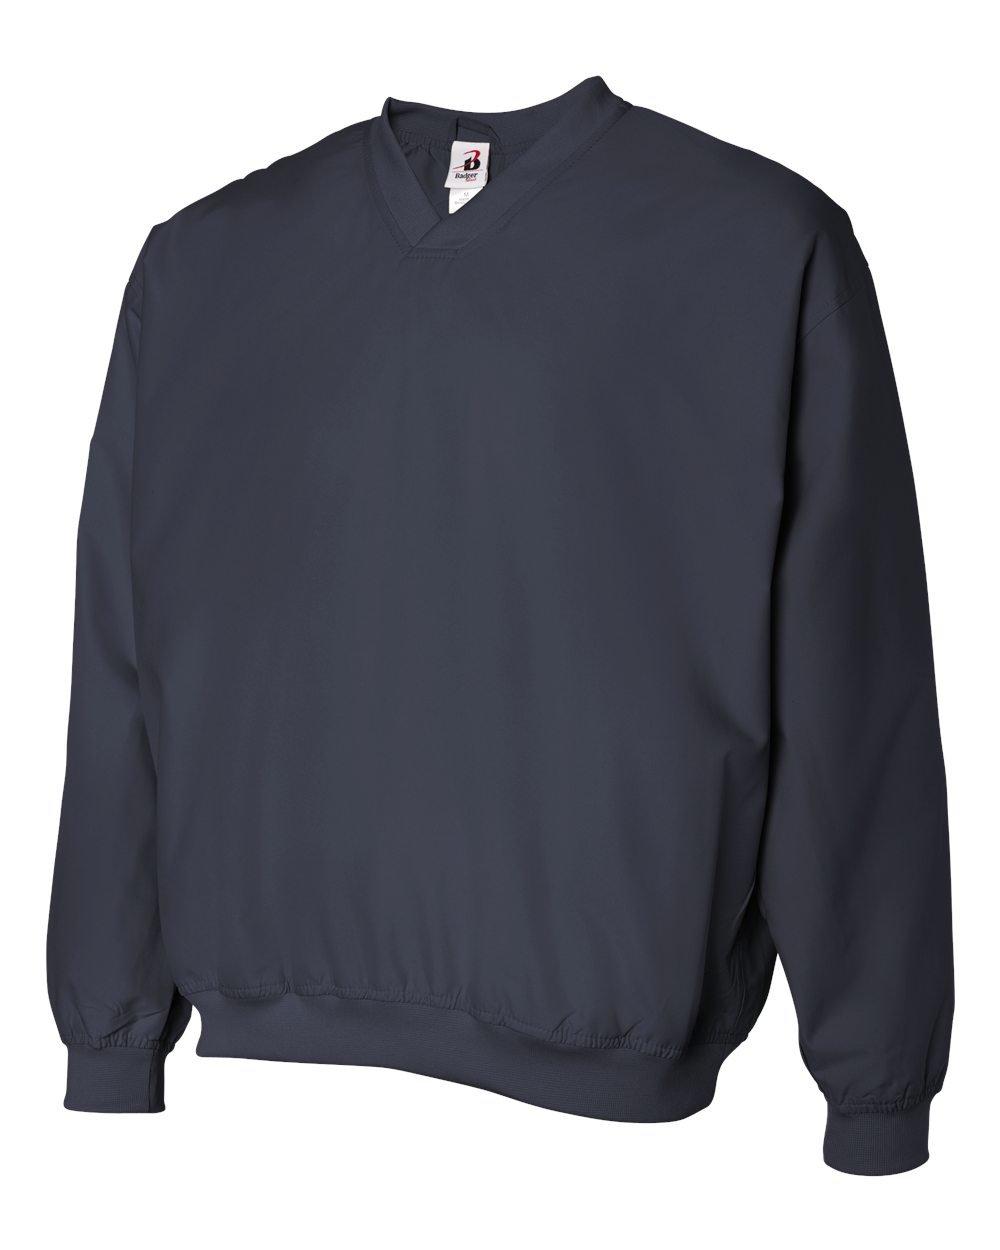 Badger Sportswear Adult Microfiber Windshirt Heritage Sportswear 7618